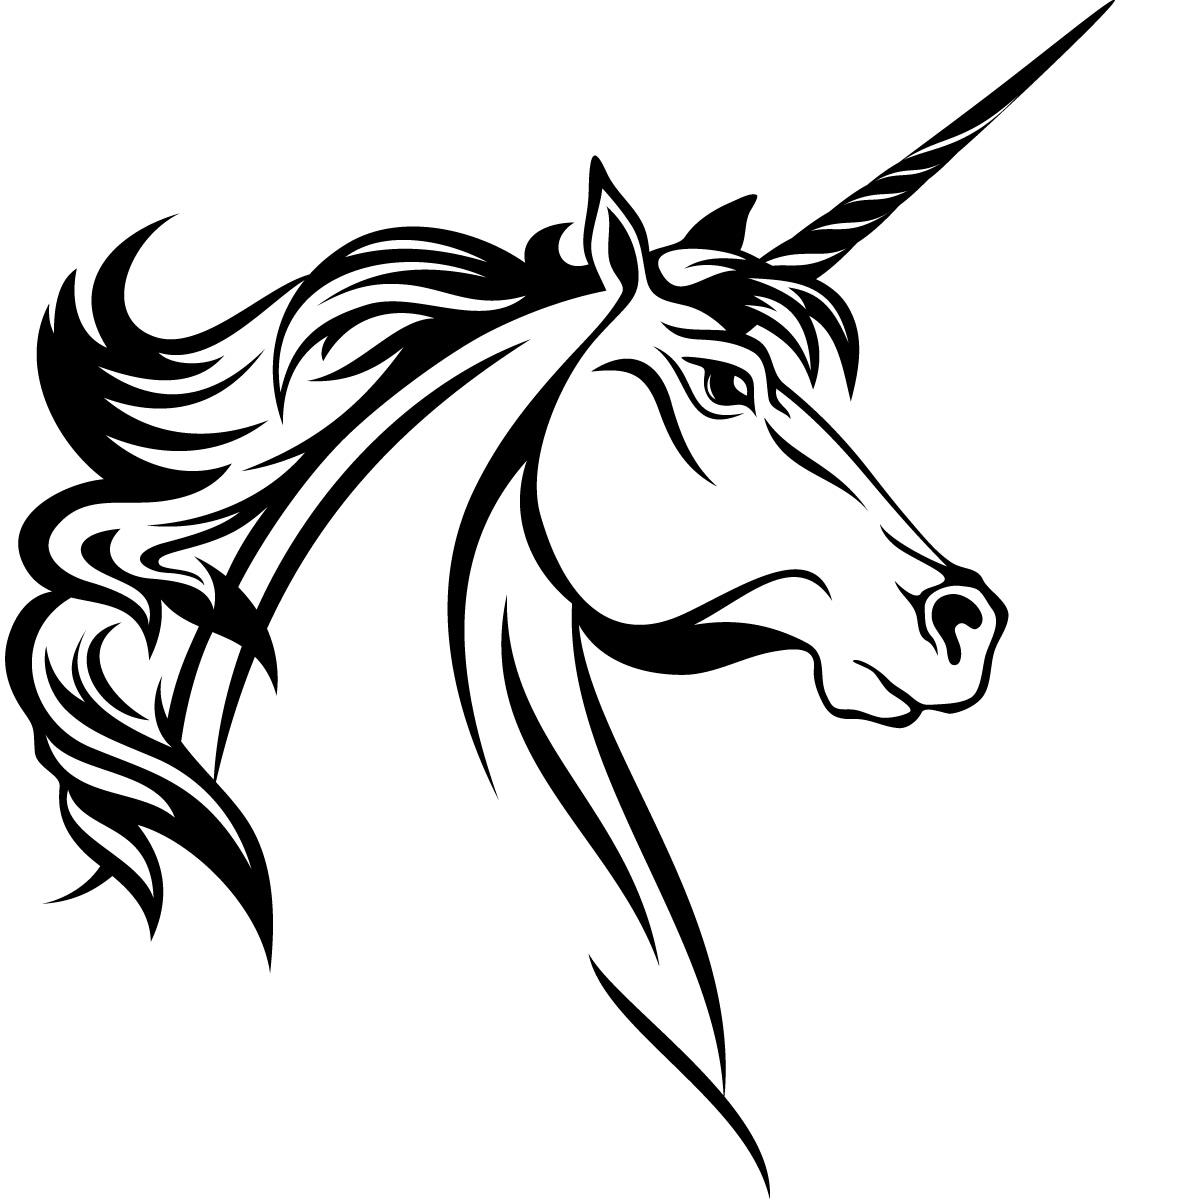 unicorn clipart black and white - photo #23